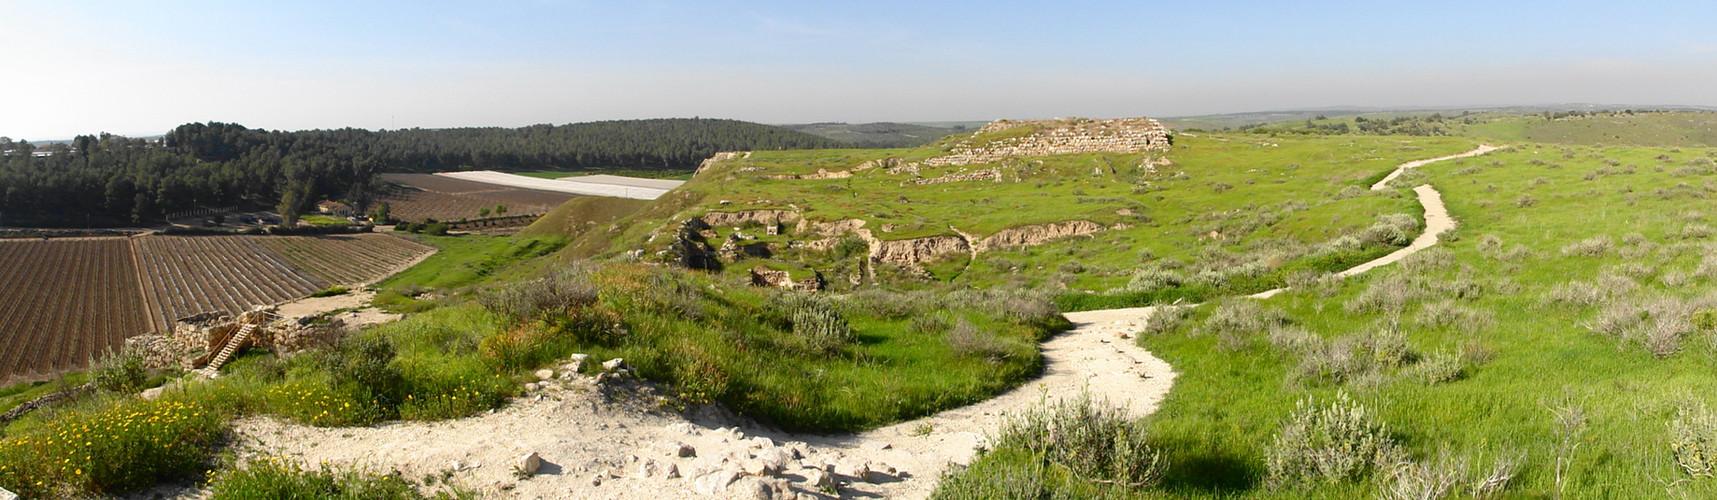 Lachish21.jpg